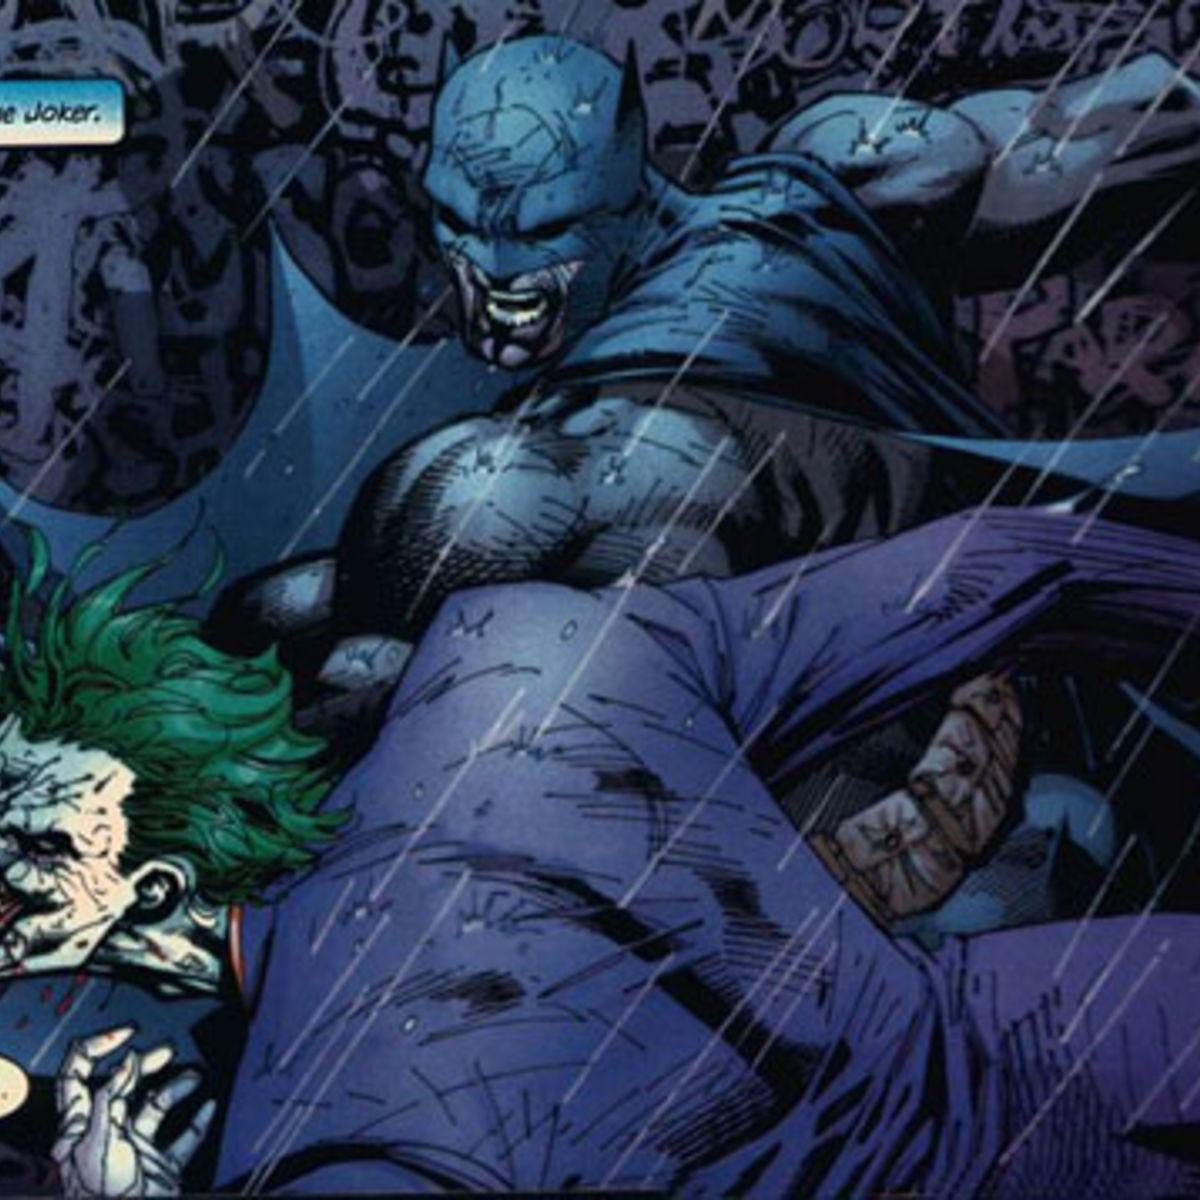 BatmanJoker022212.jpg